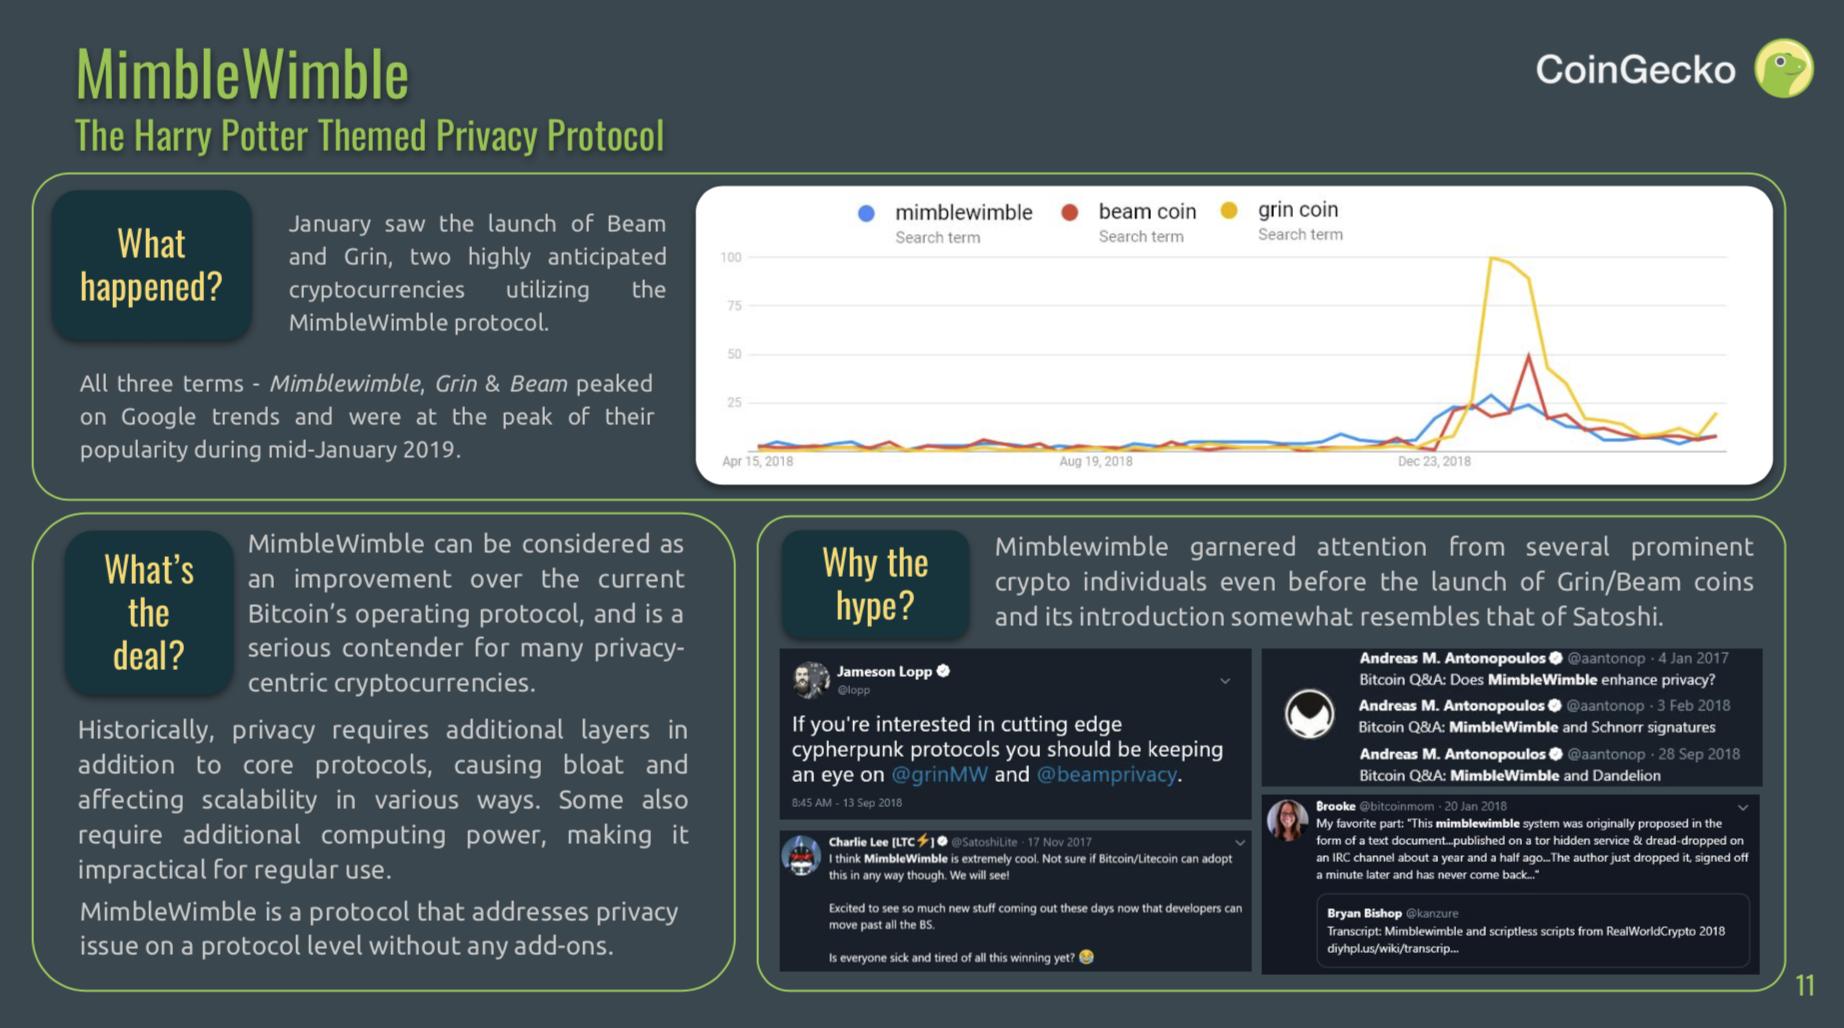 CoinGecko Releases 2019 Q1 Crypto Report - CoinGecko Blog